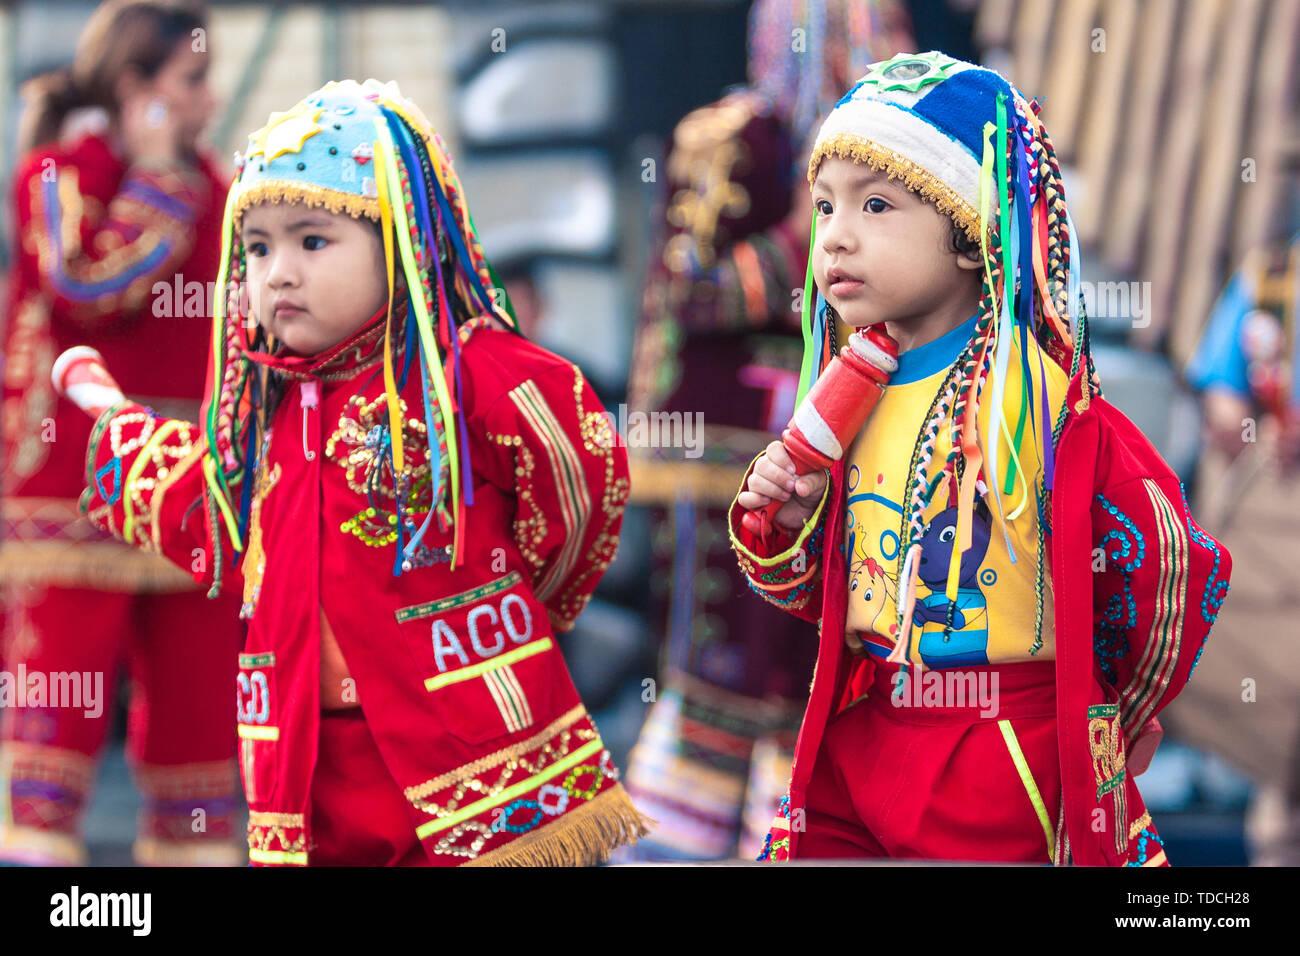 Peruvian Boy in traditional costume near Cuzco Stock Photo